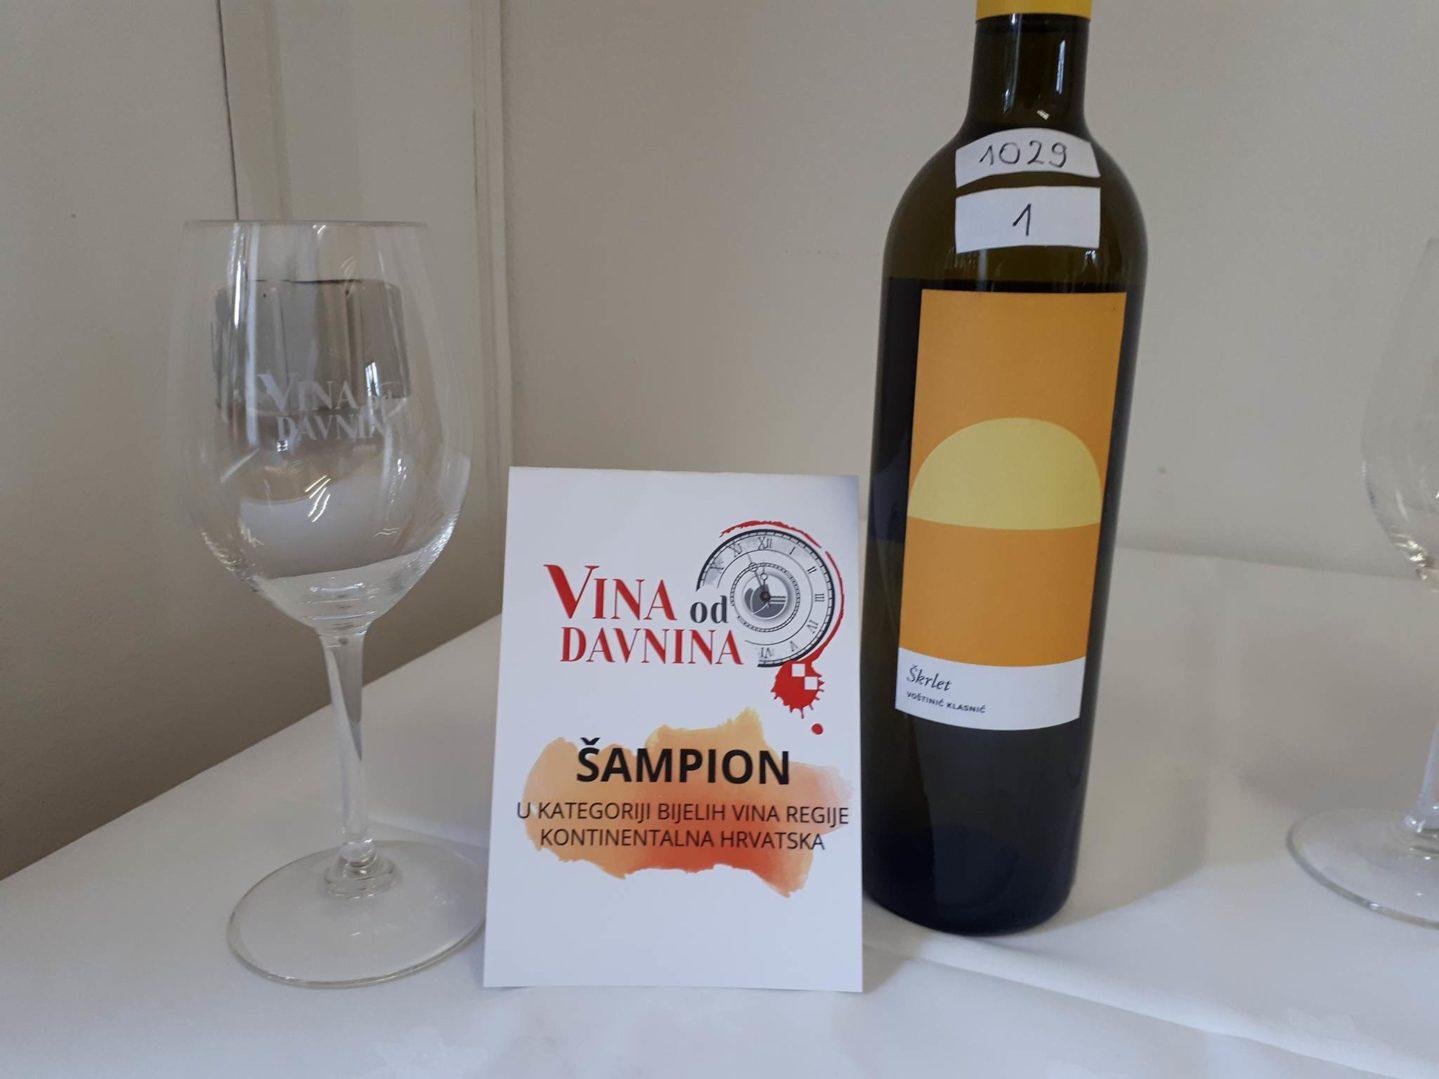 vina od davnina (1)